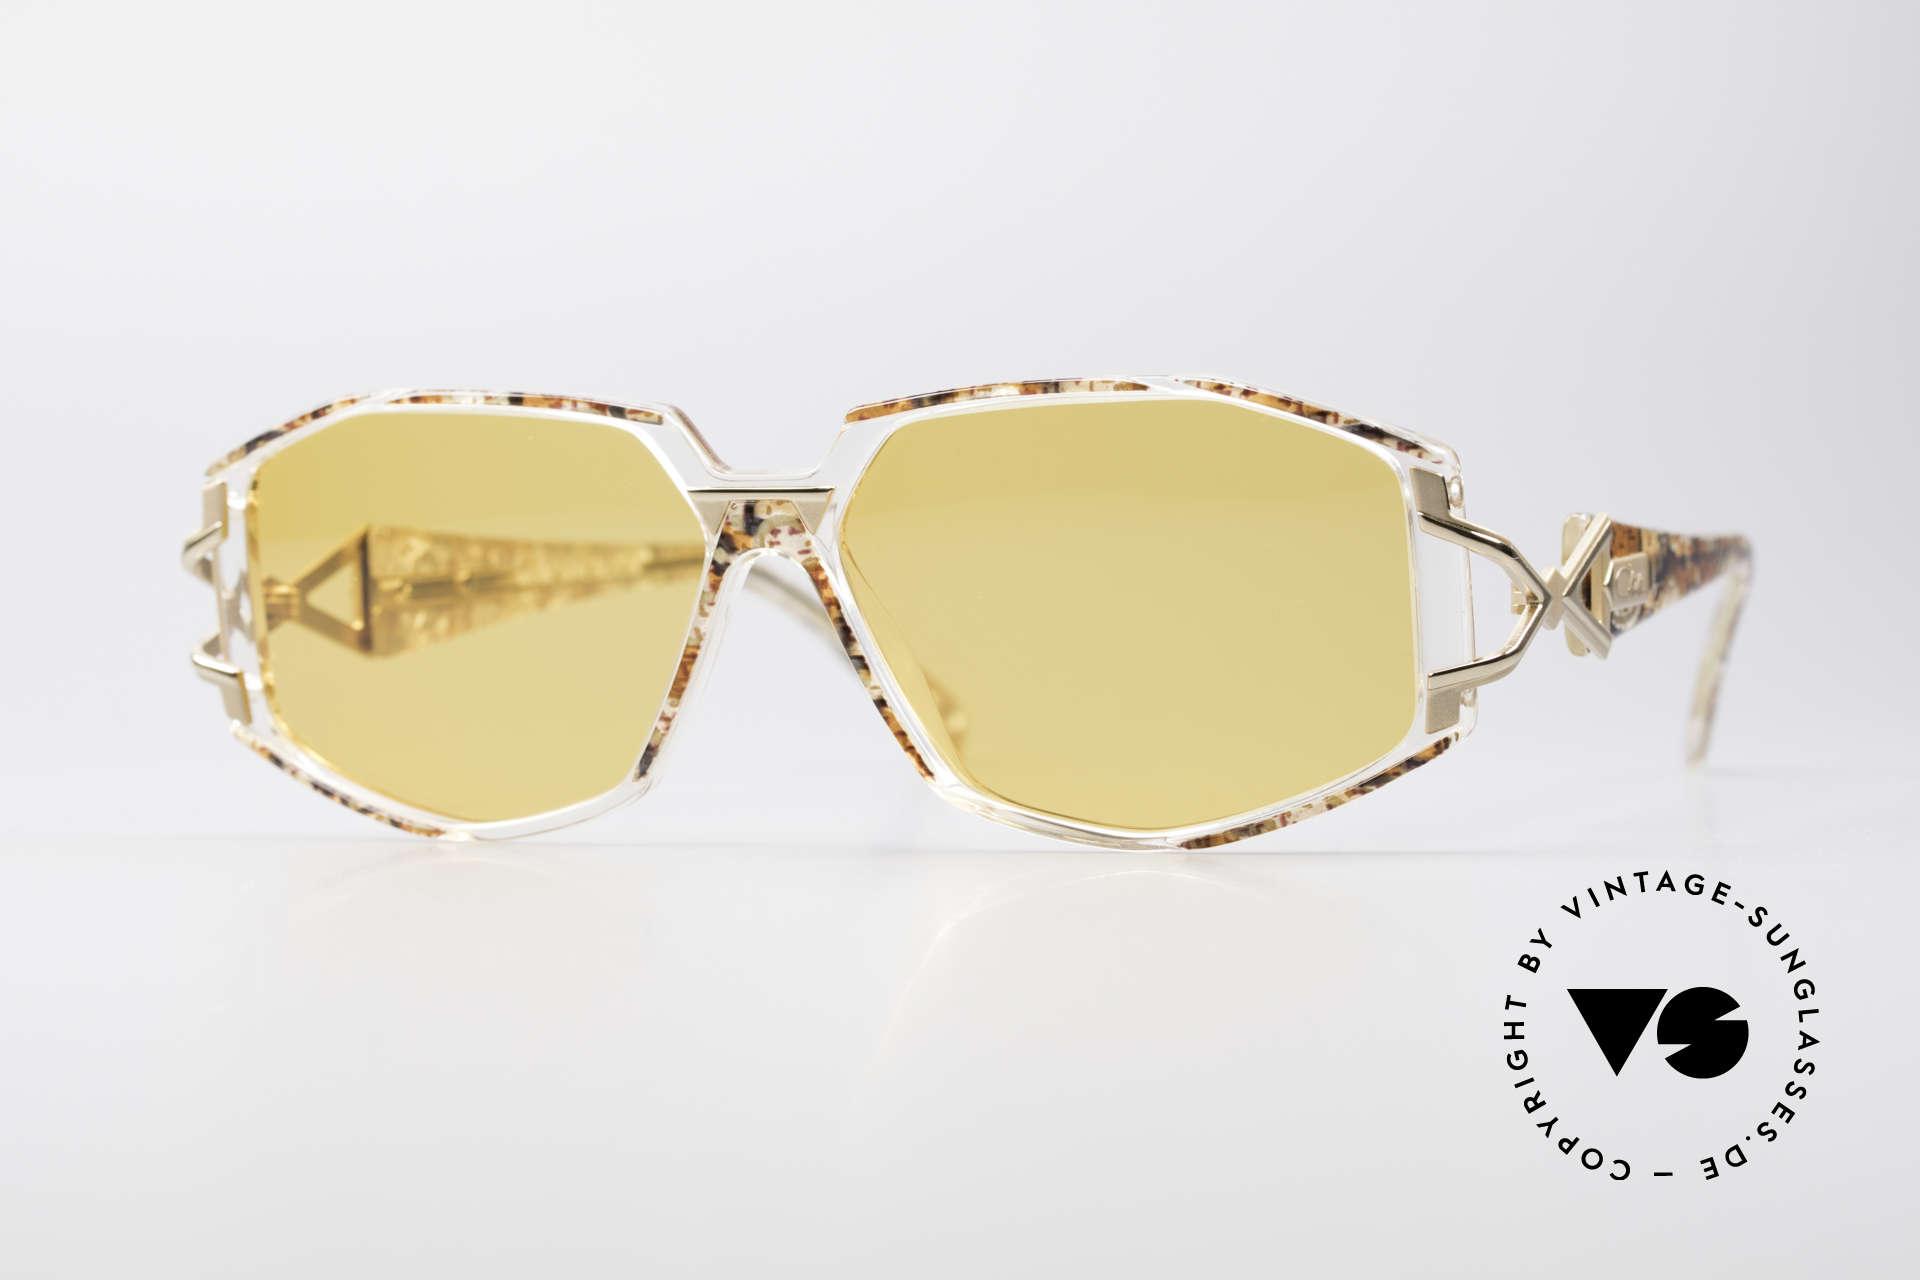 Cazal 368 90's Hip Hop Designer Frame, adorned Cazal sunglasses from the 90's, Hip Hop Style, Made for Women